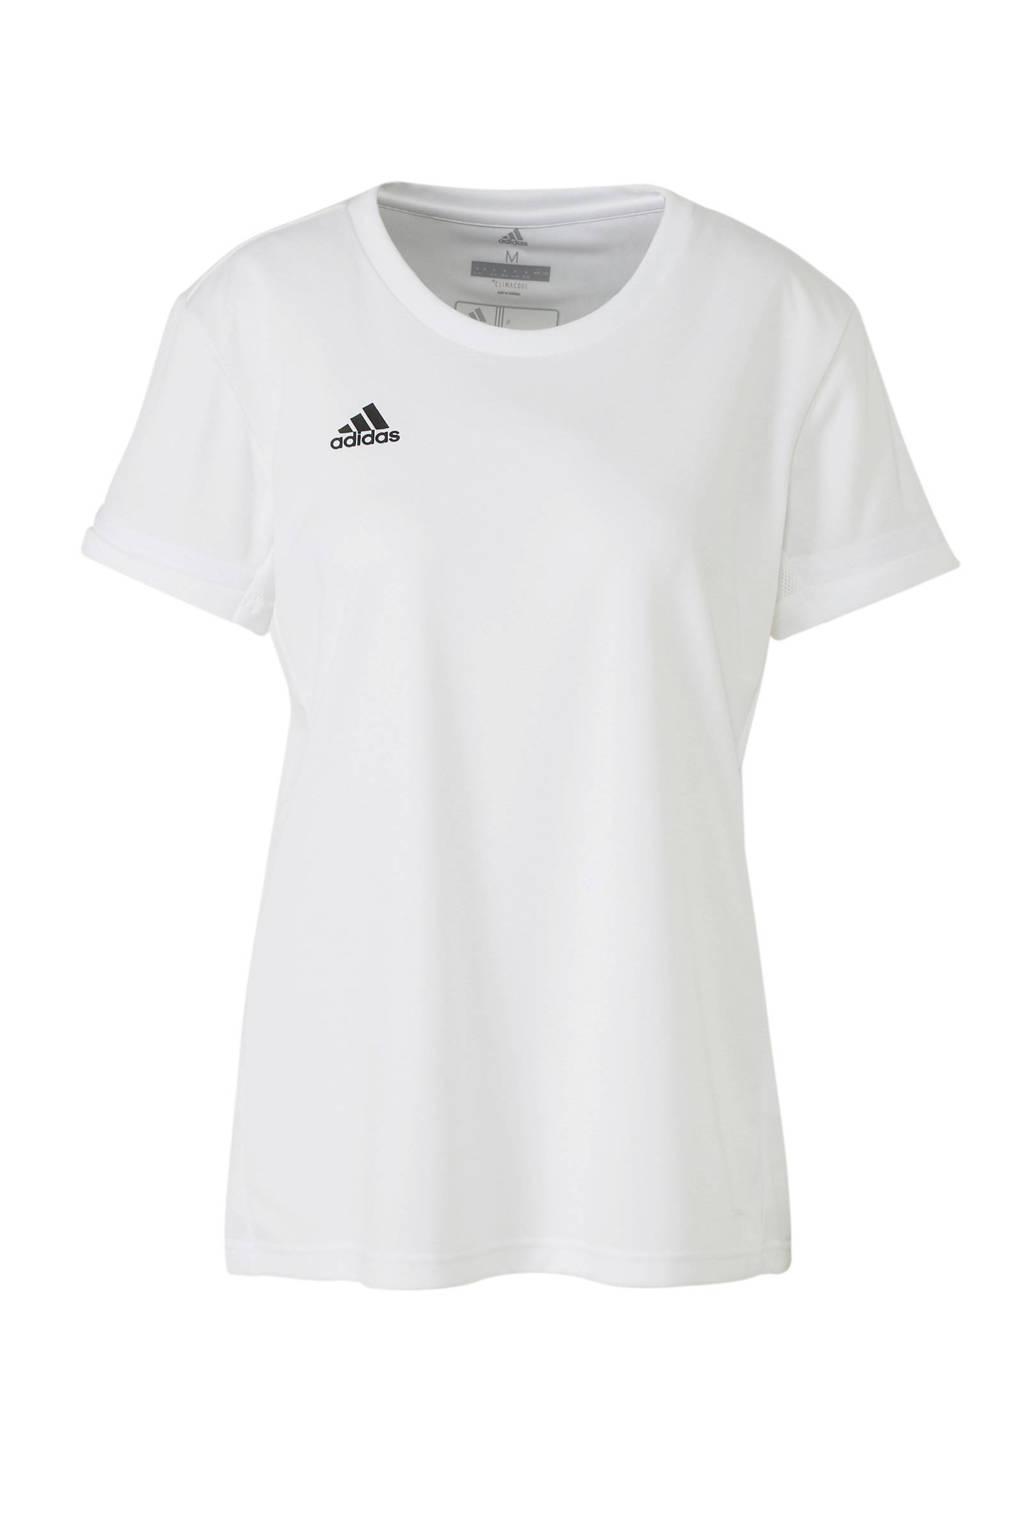 adidas Performance sport T-shirt T19 wit, Wit